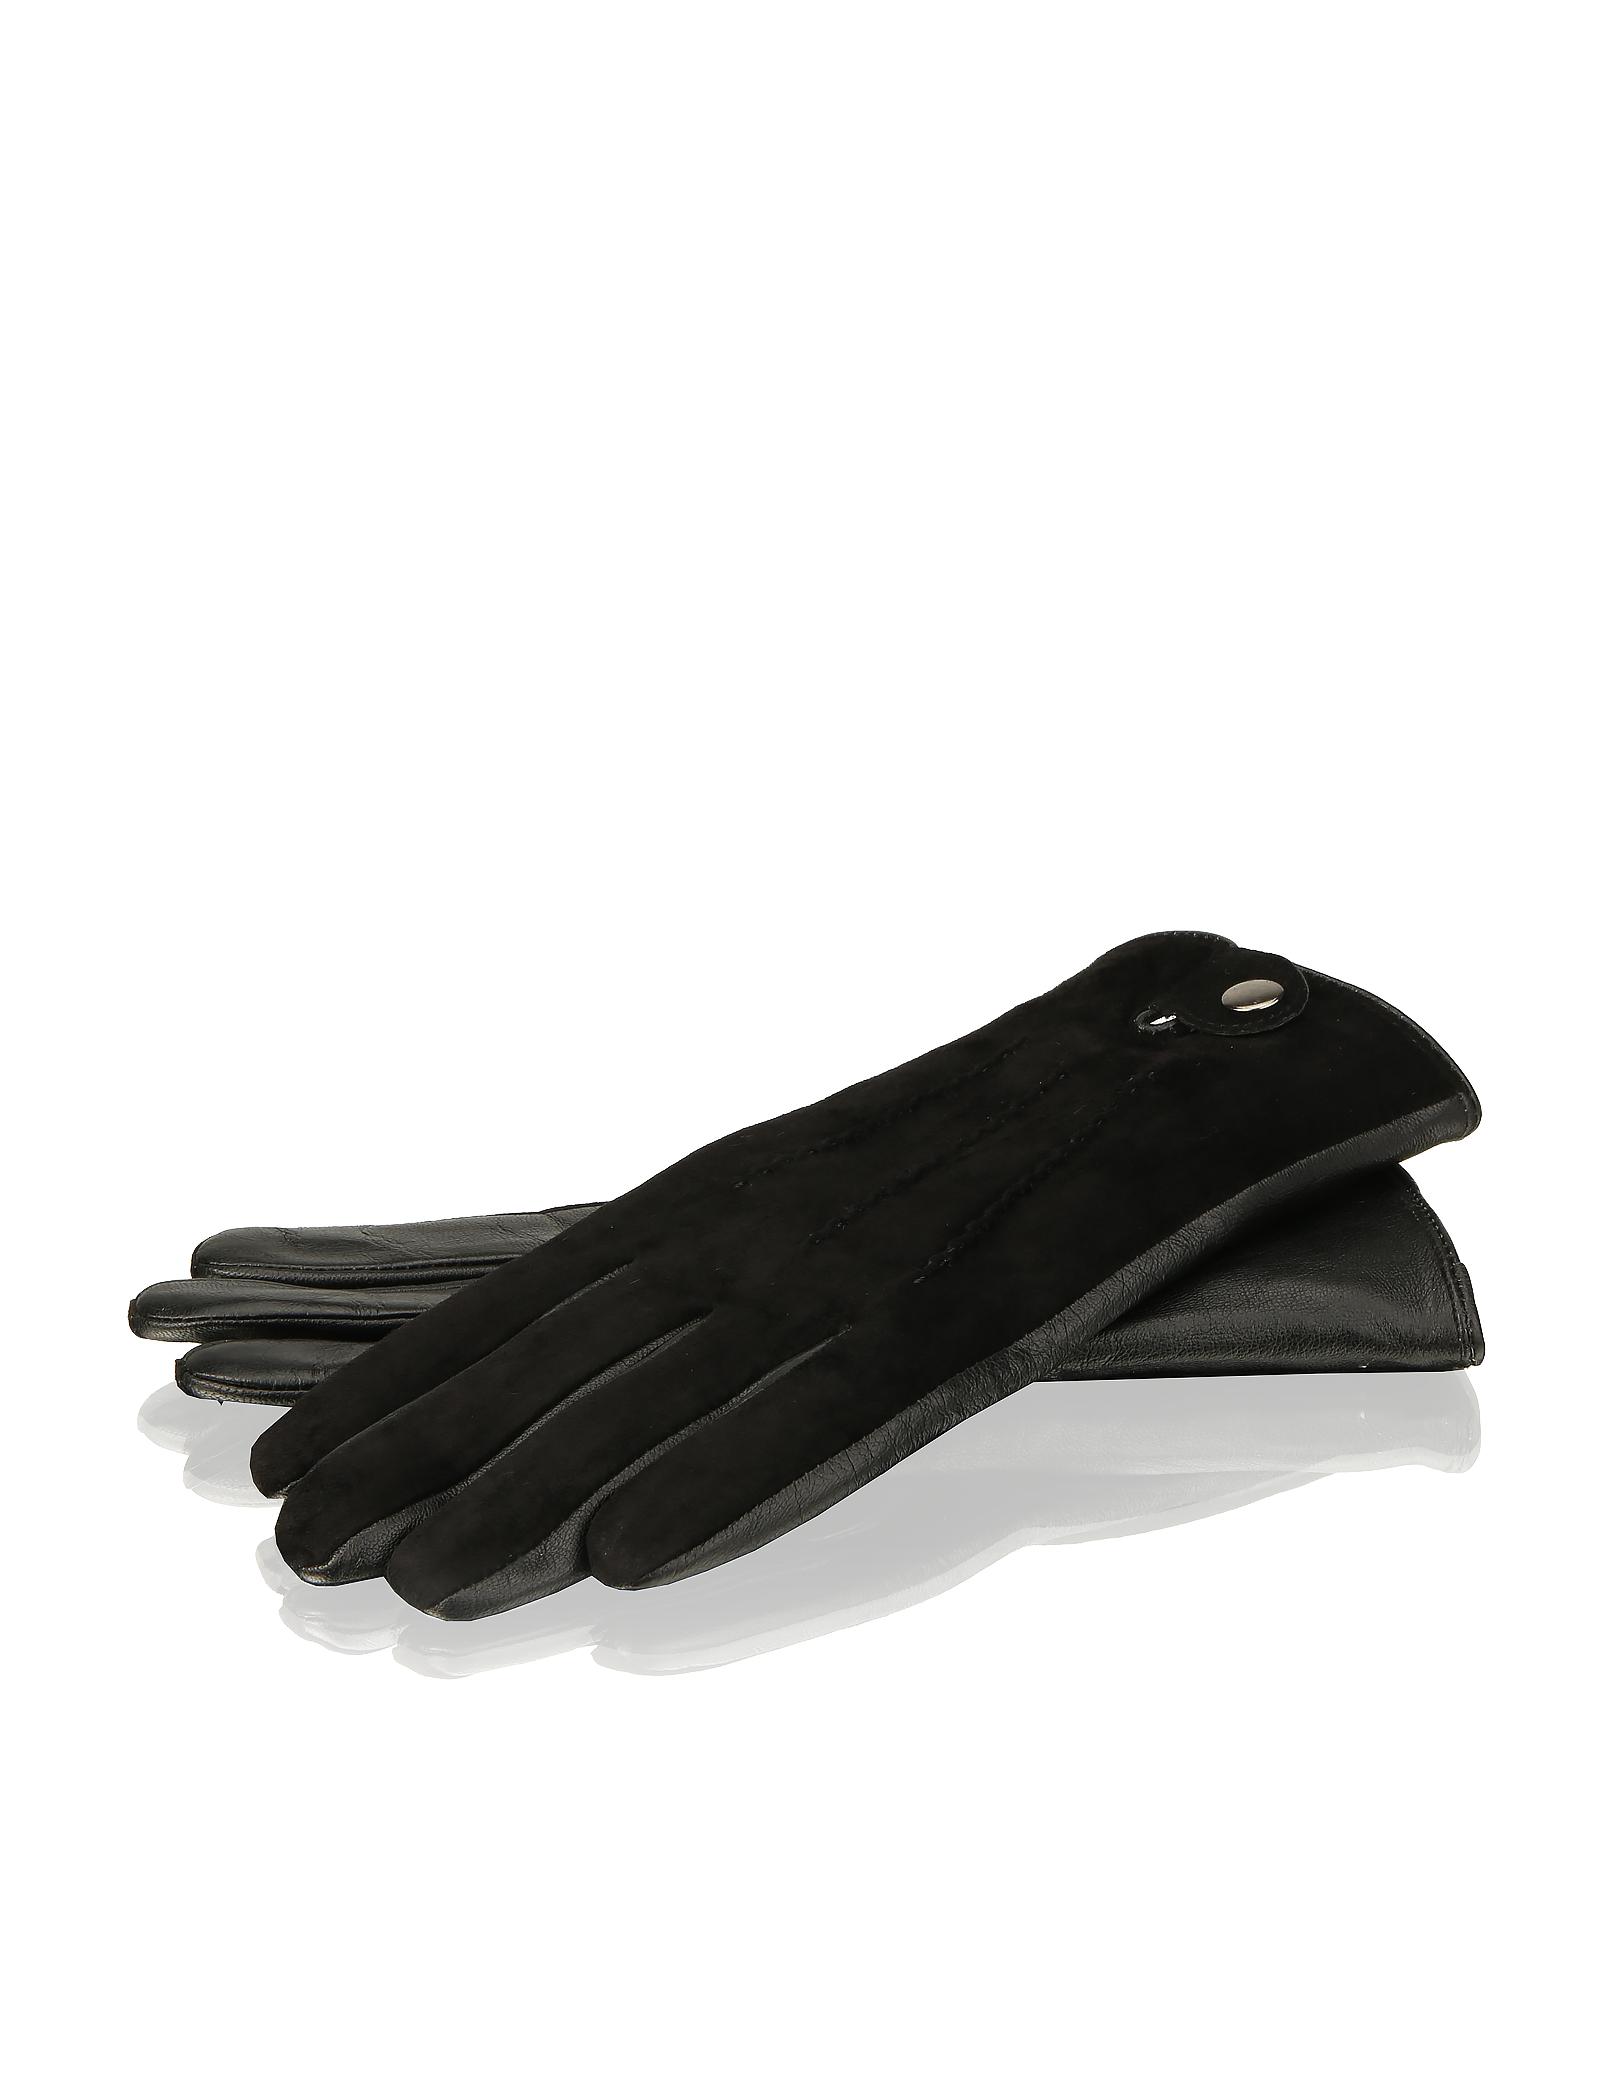 Handschuhe - Lazzarini Handschuh schwarz  - Onlineshop HUMANIC